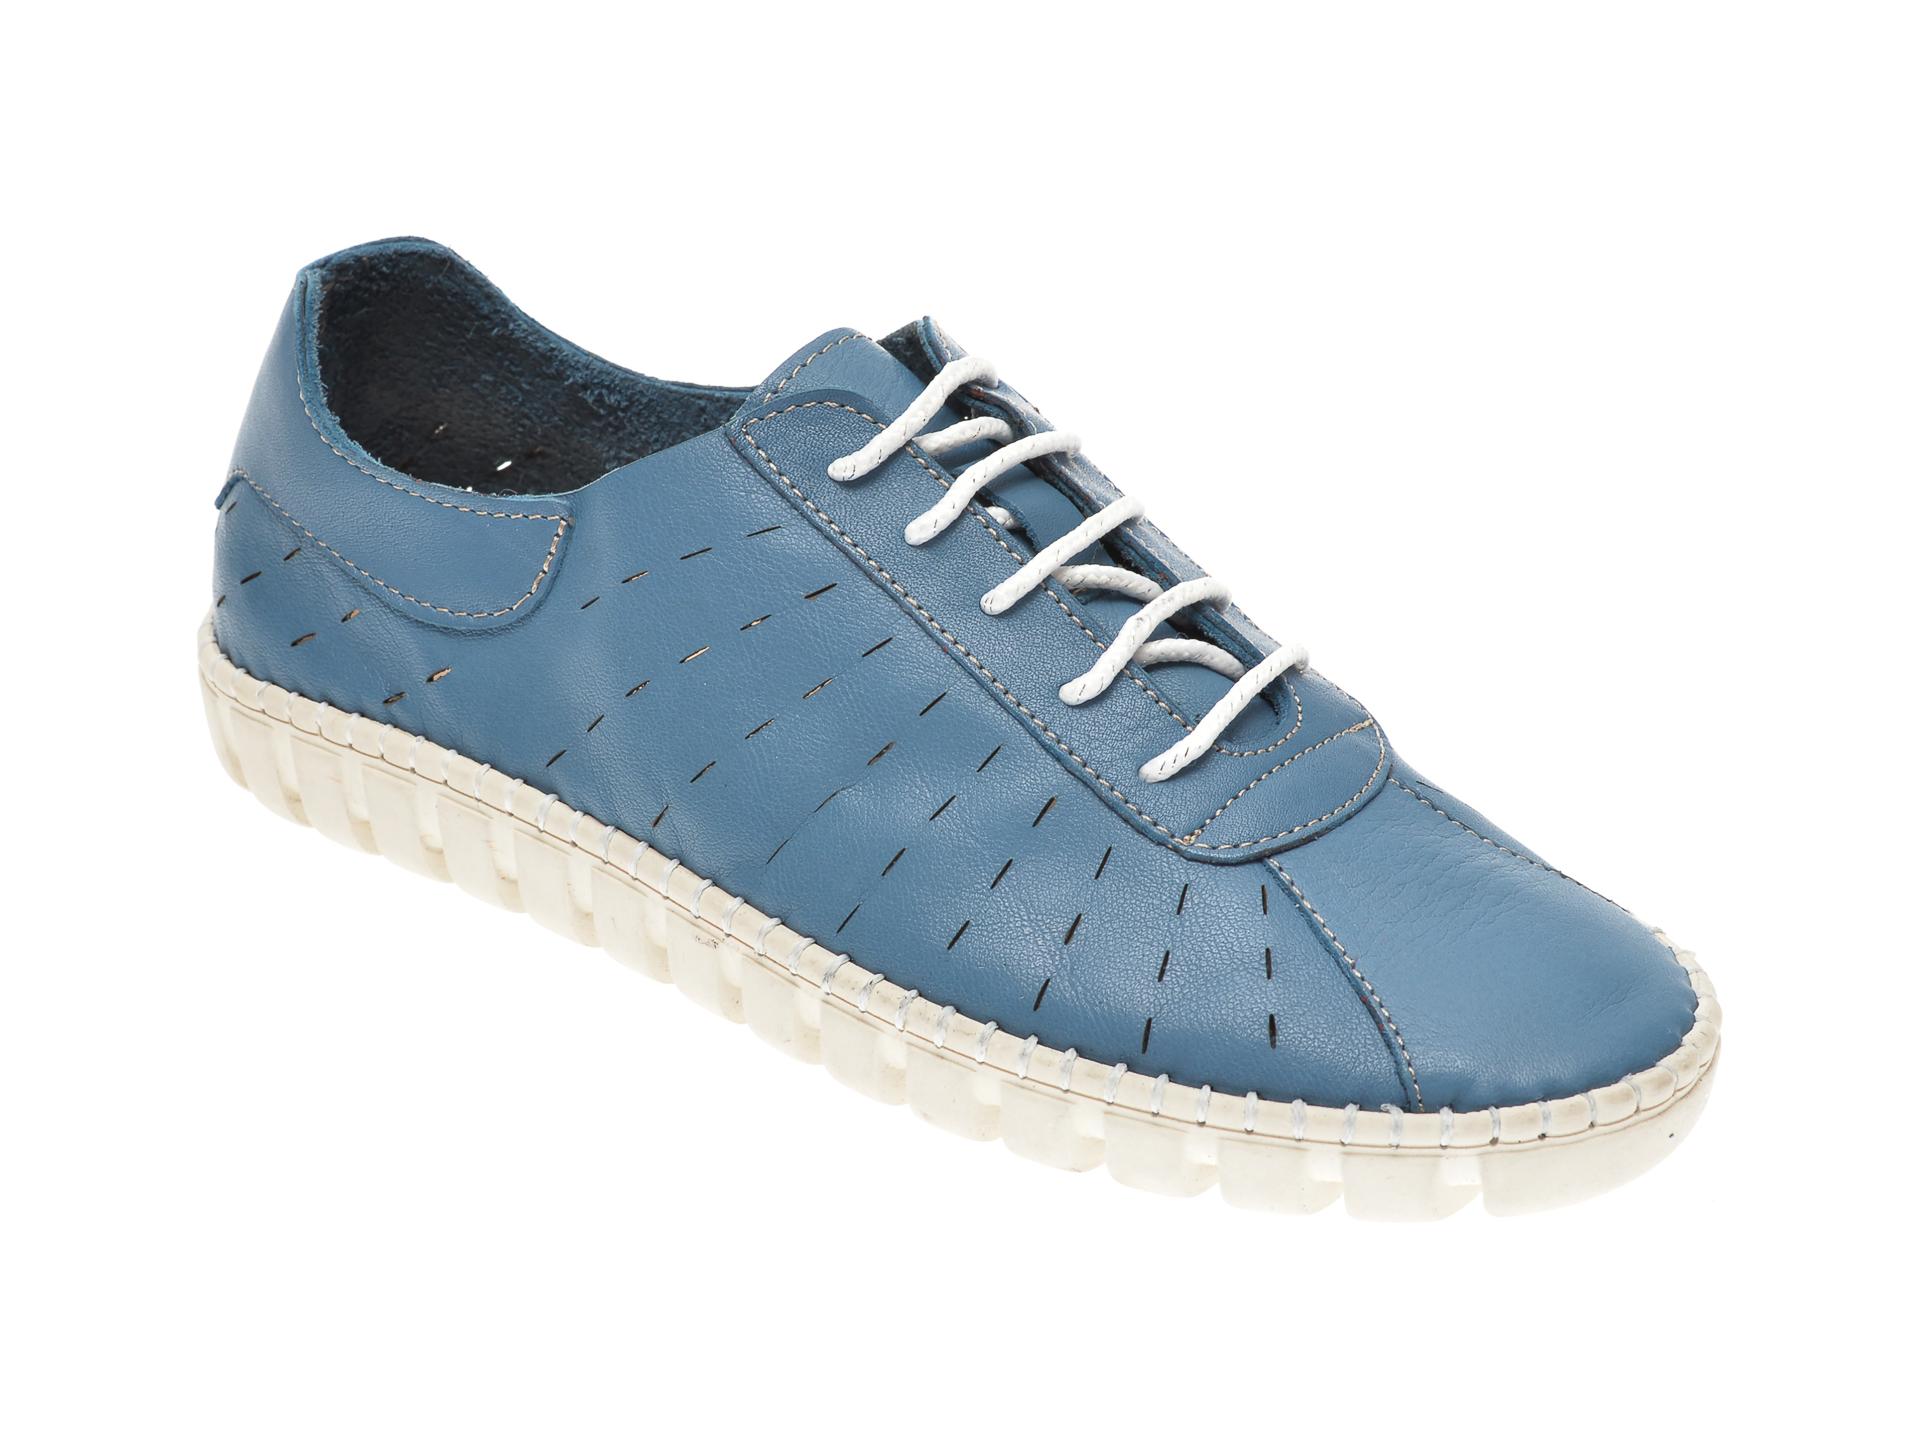 Pantofi PAVARELLA albastri, 6020, din piele naturala